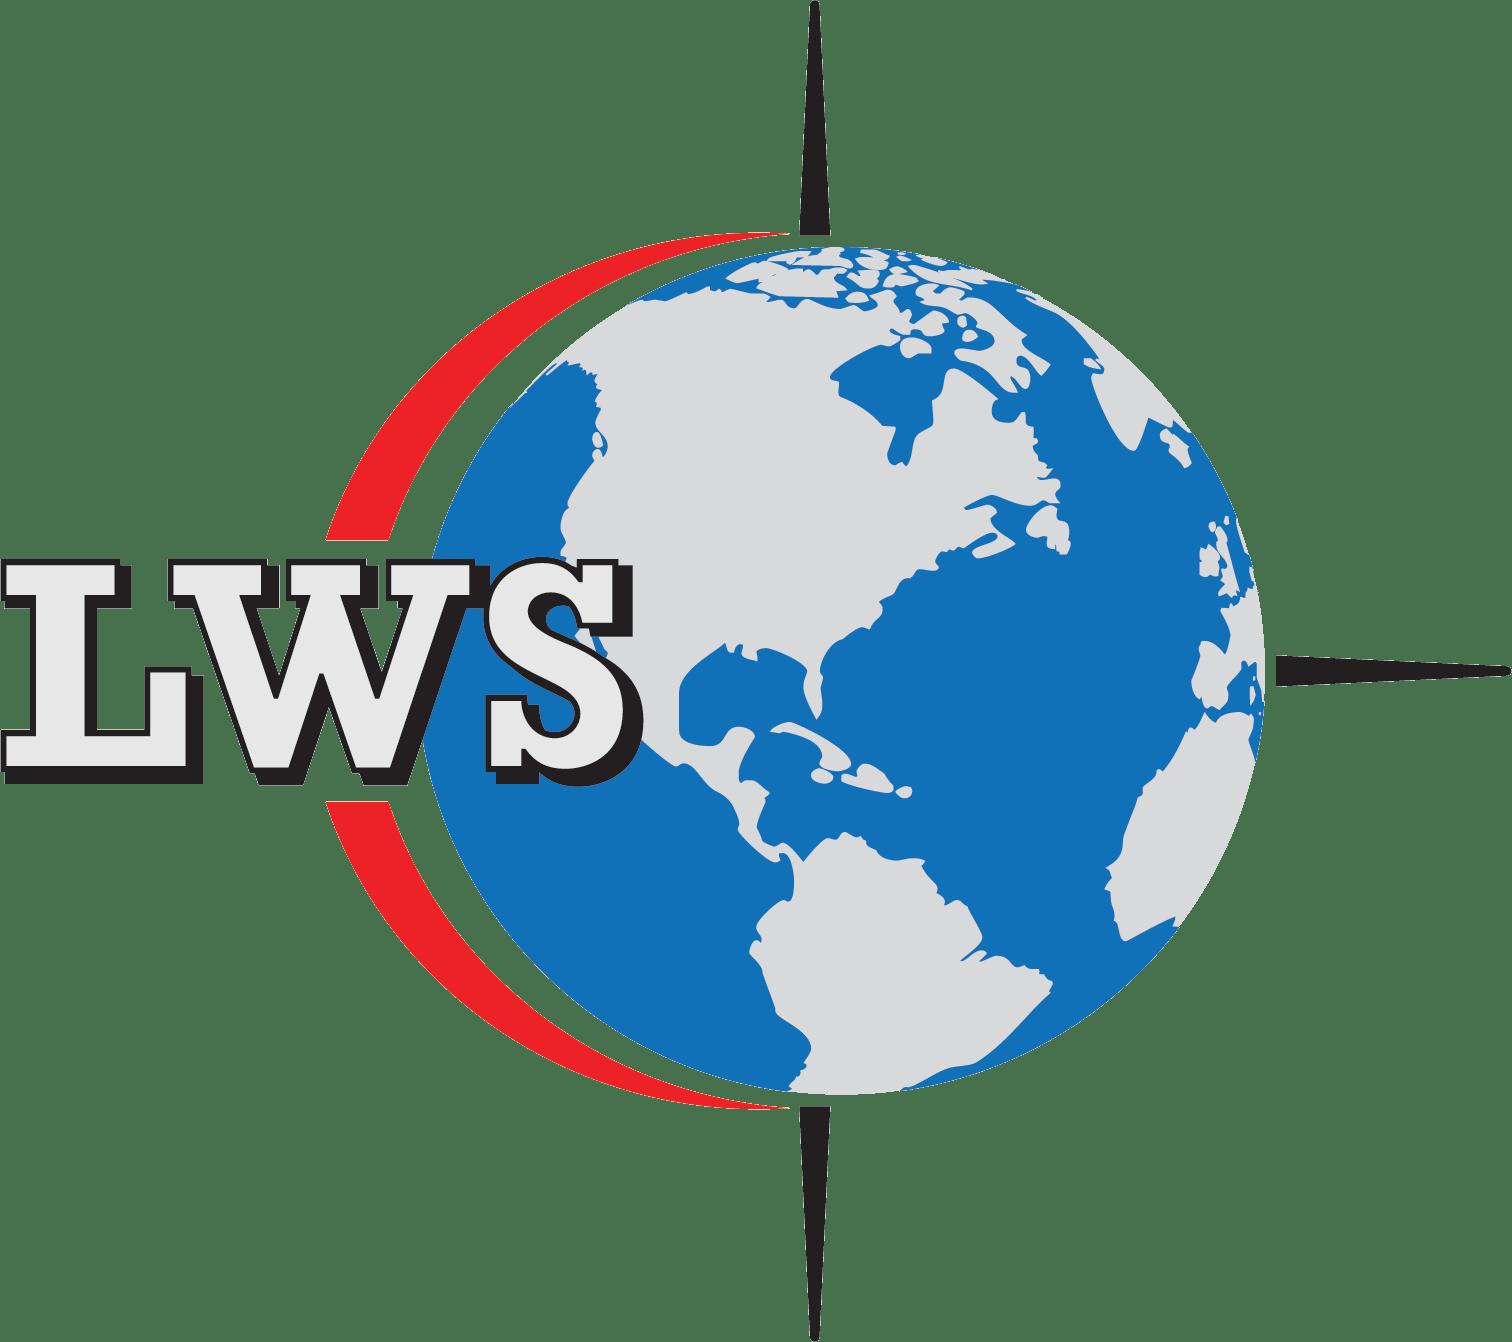 Lw Company